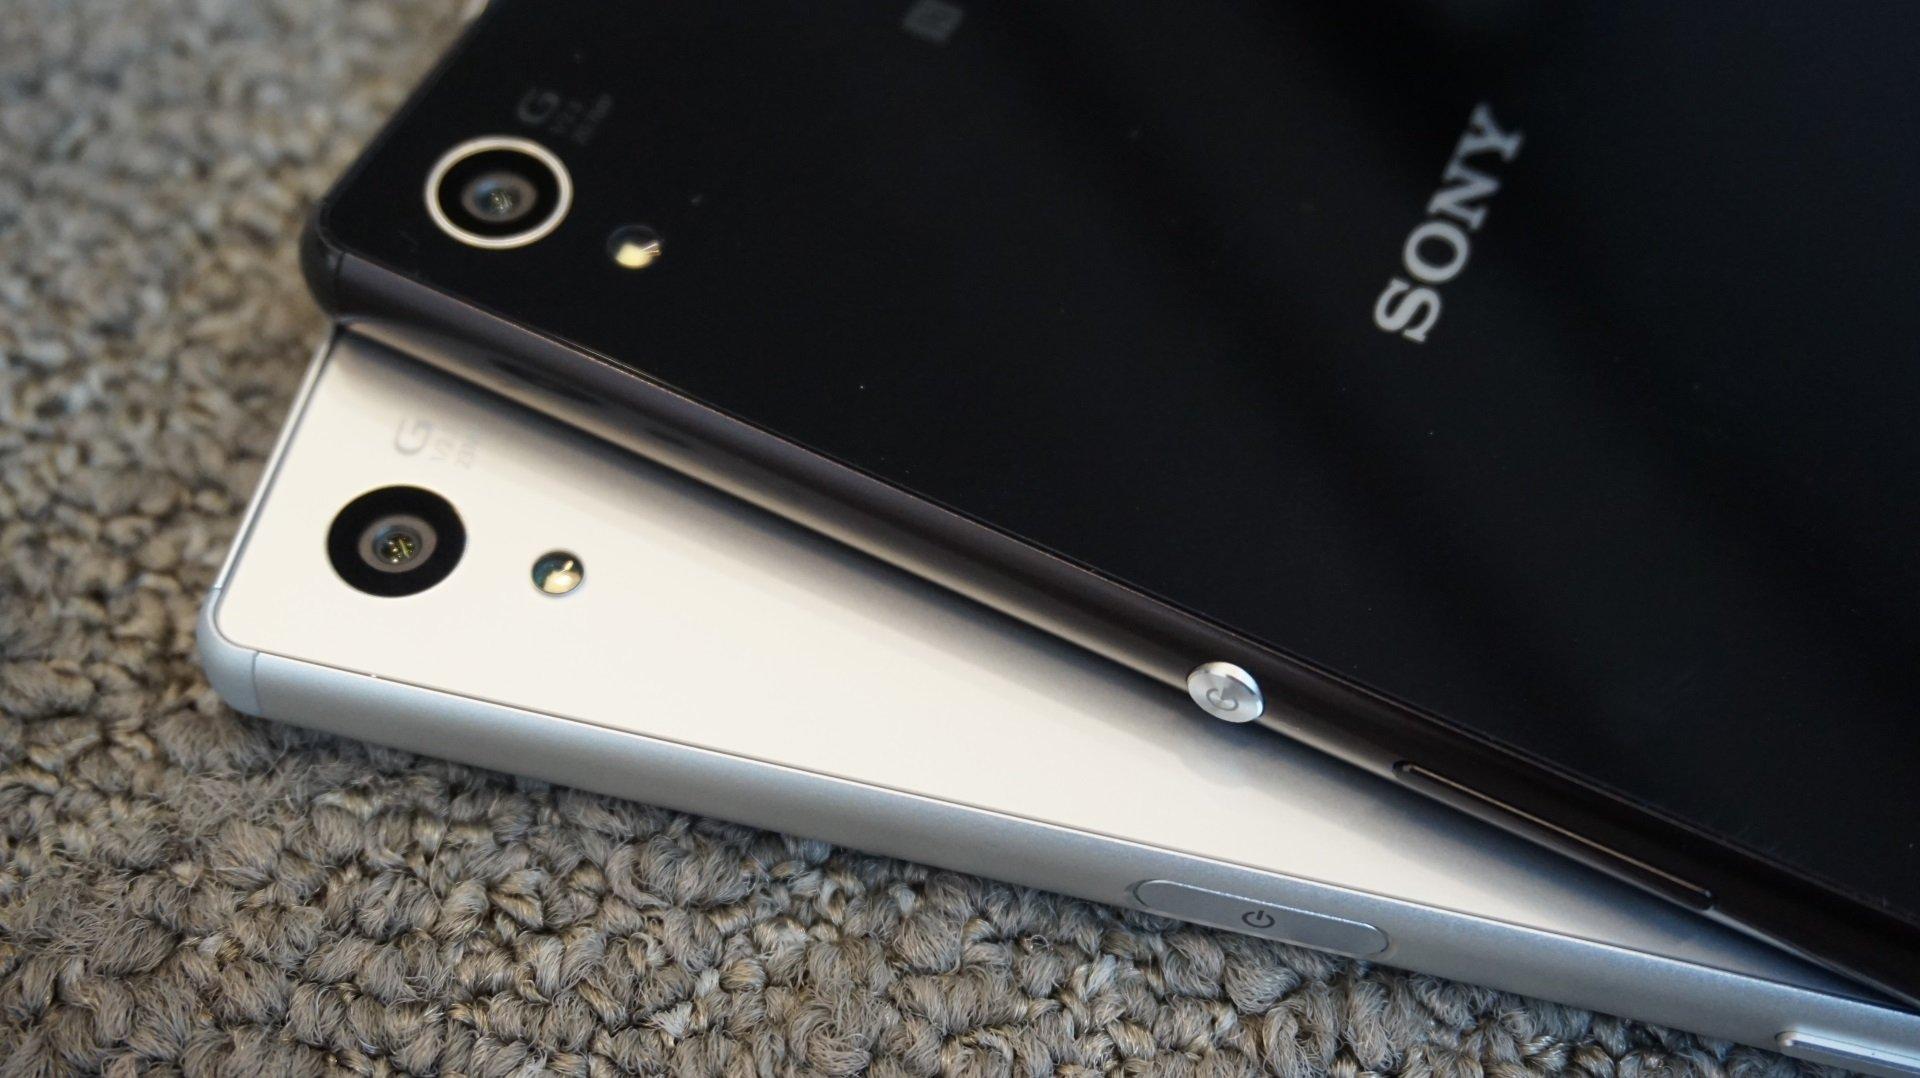 Sony Xperia Z5 review | Expert Reviews